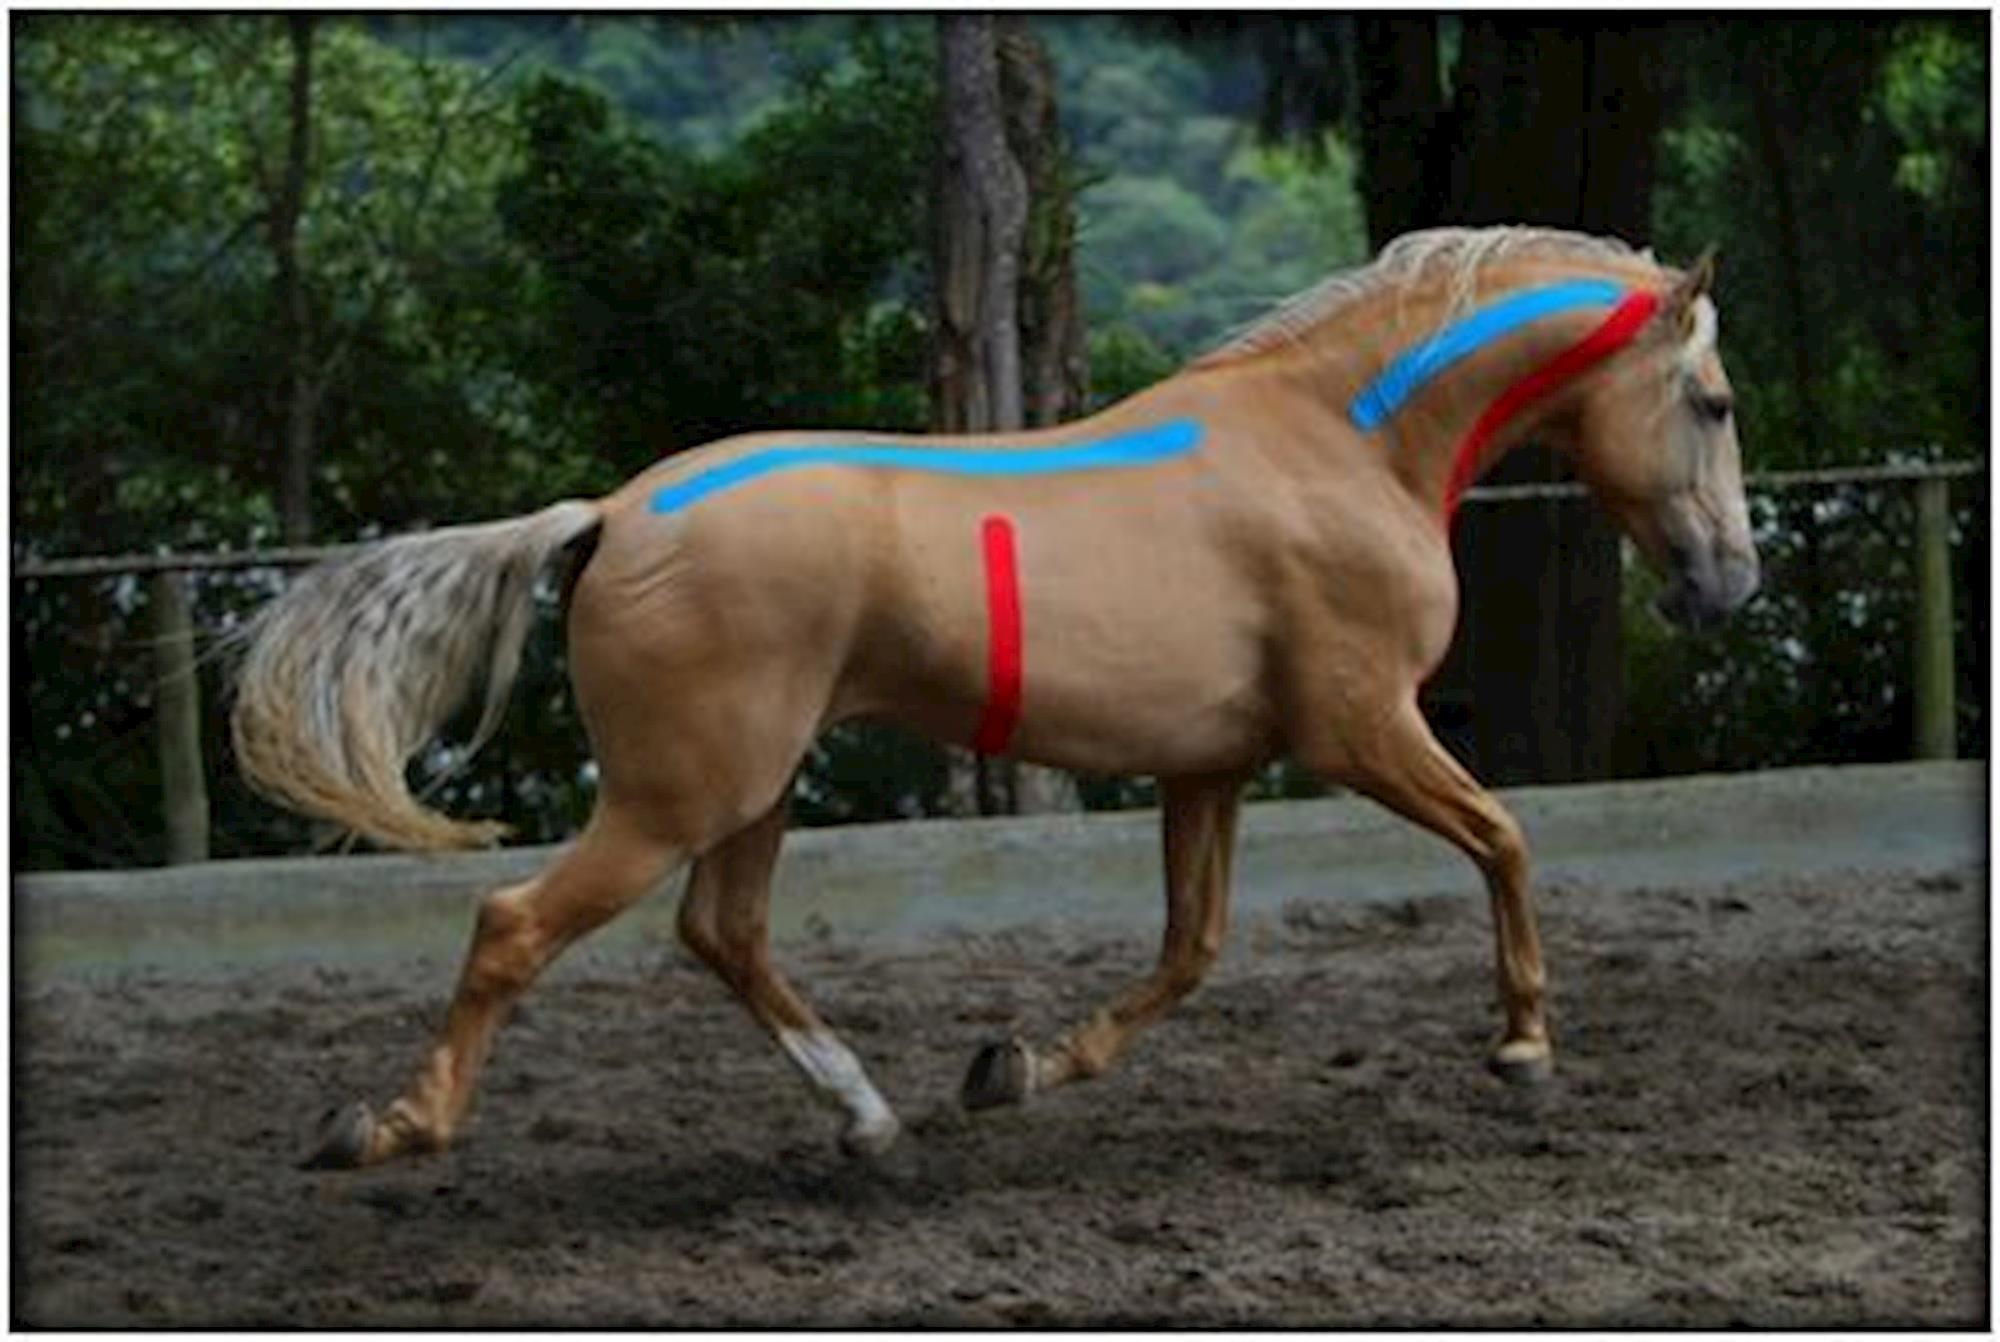 veterinária, kinesio, taping, relaxamento, cavalo, equino, Davi Carrano